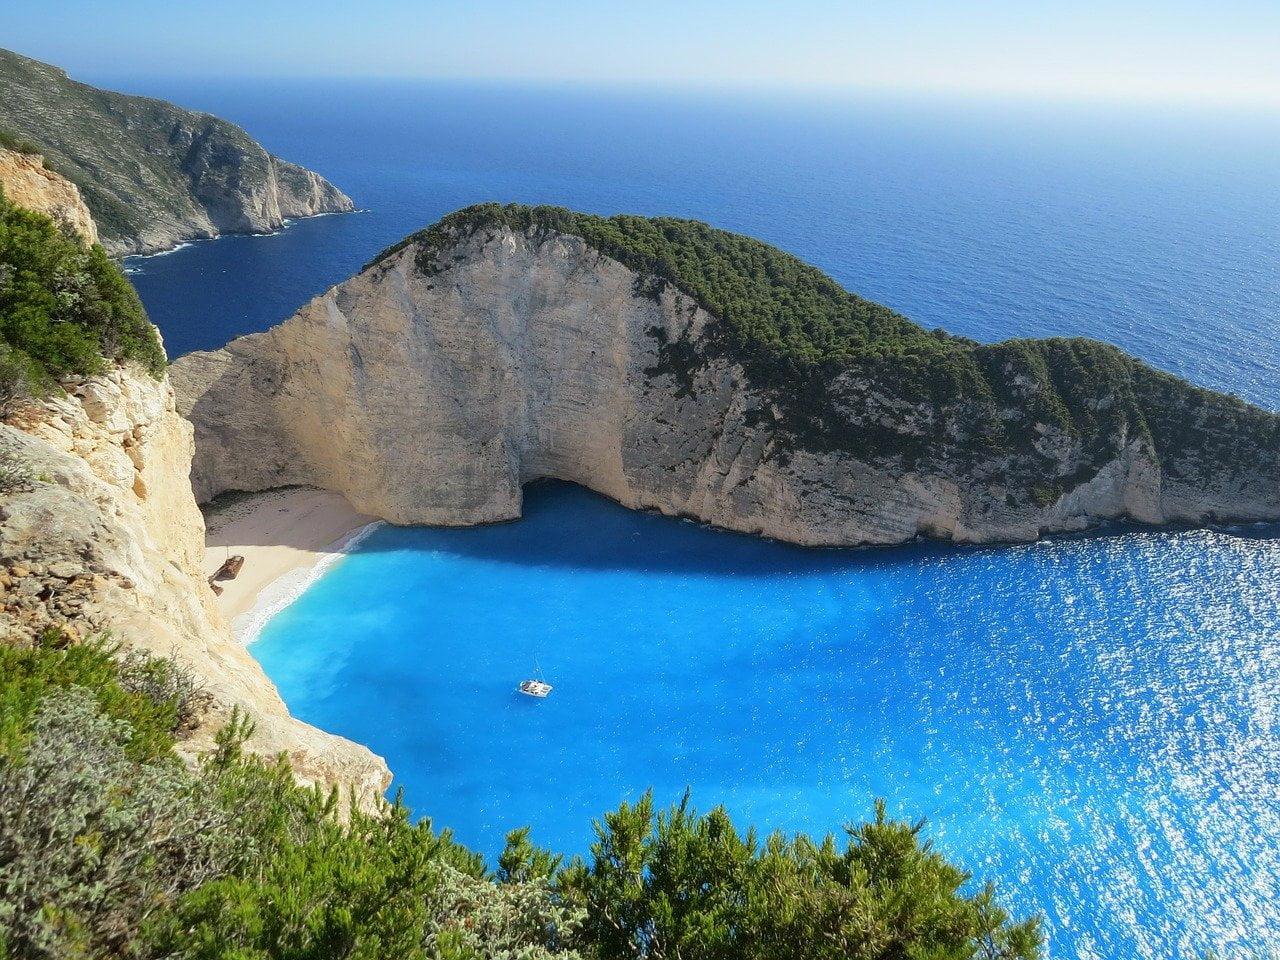 Vacanța românilor în Grecia